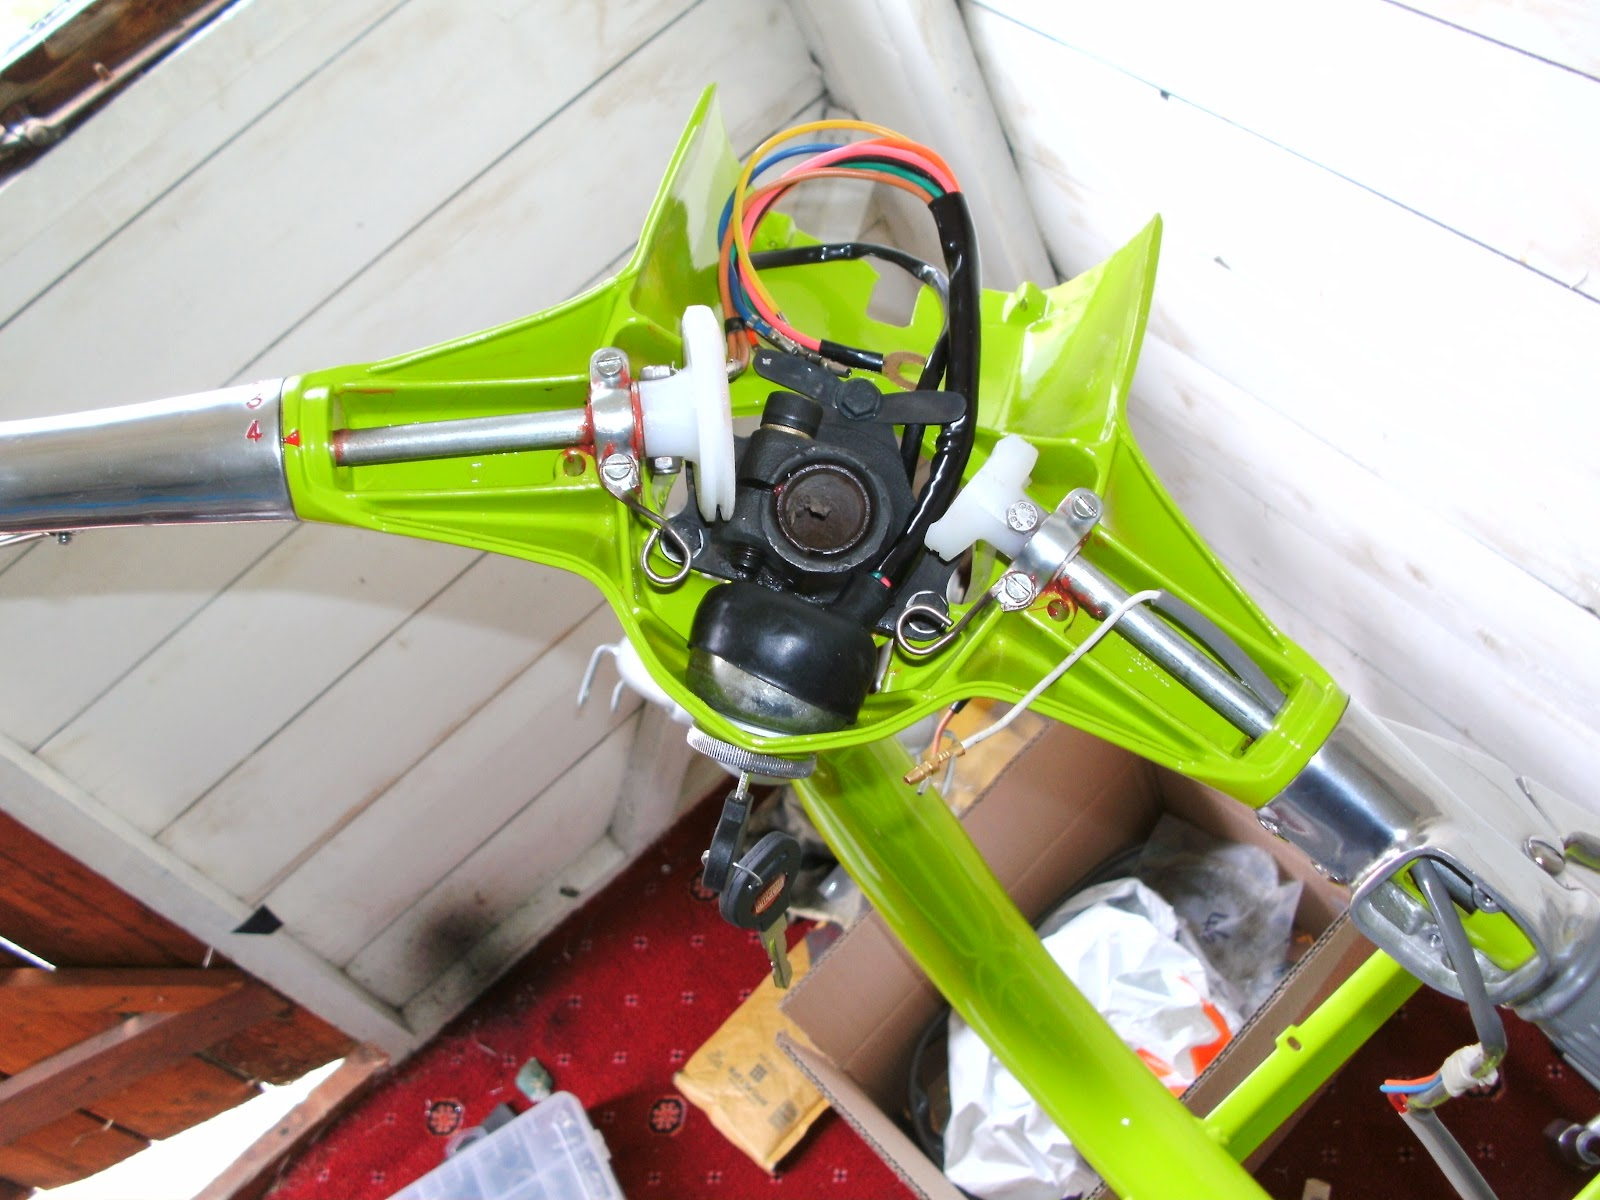 lambretta wiring diagram with indicators shark brain serveta li 150 headset and wheels